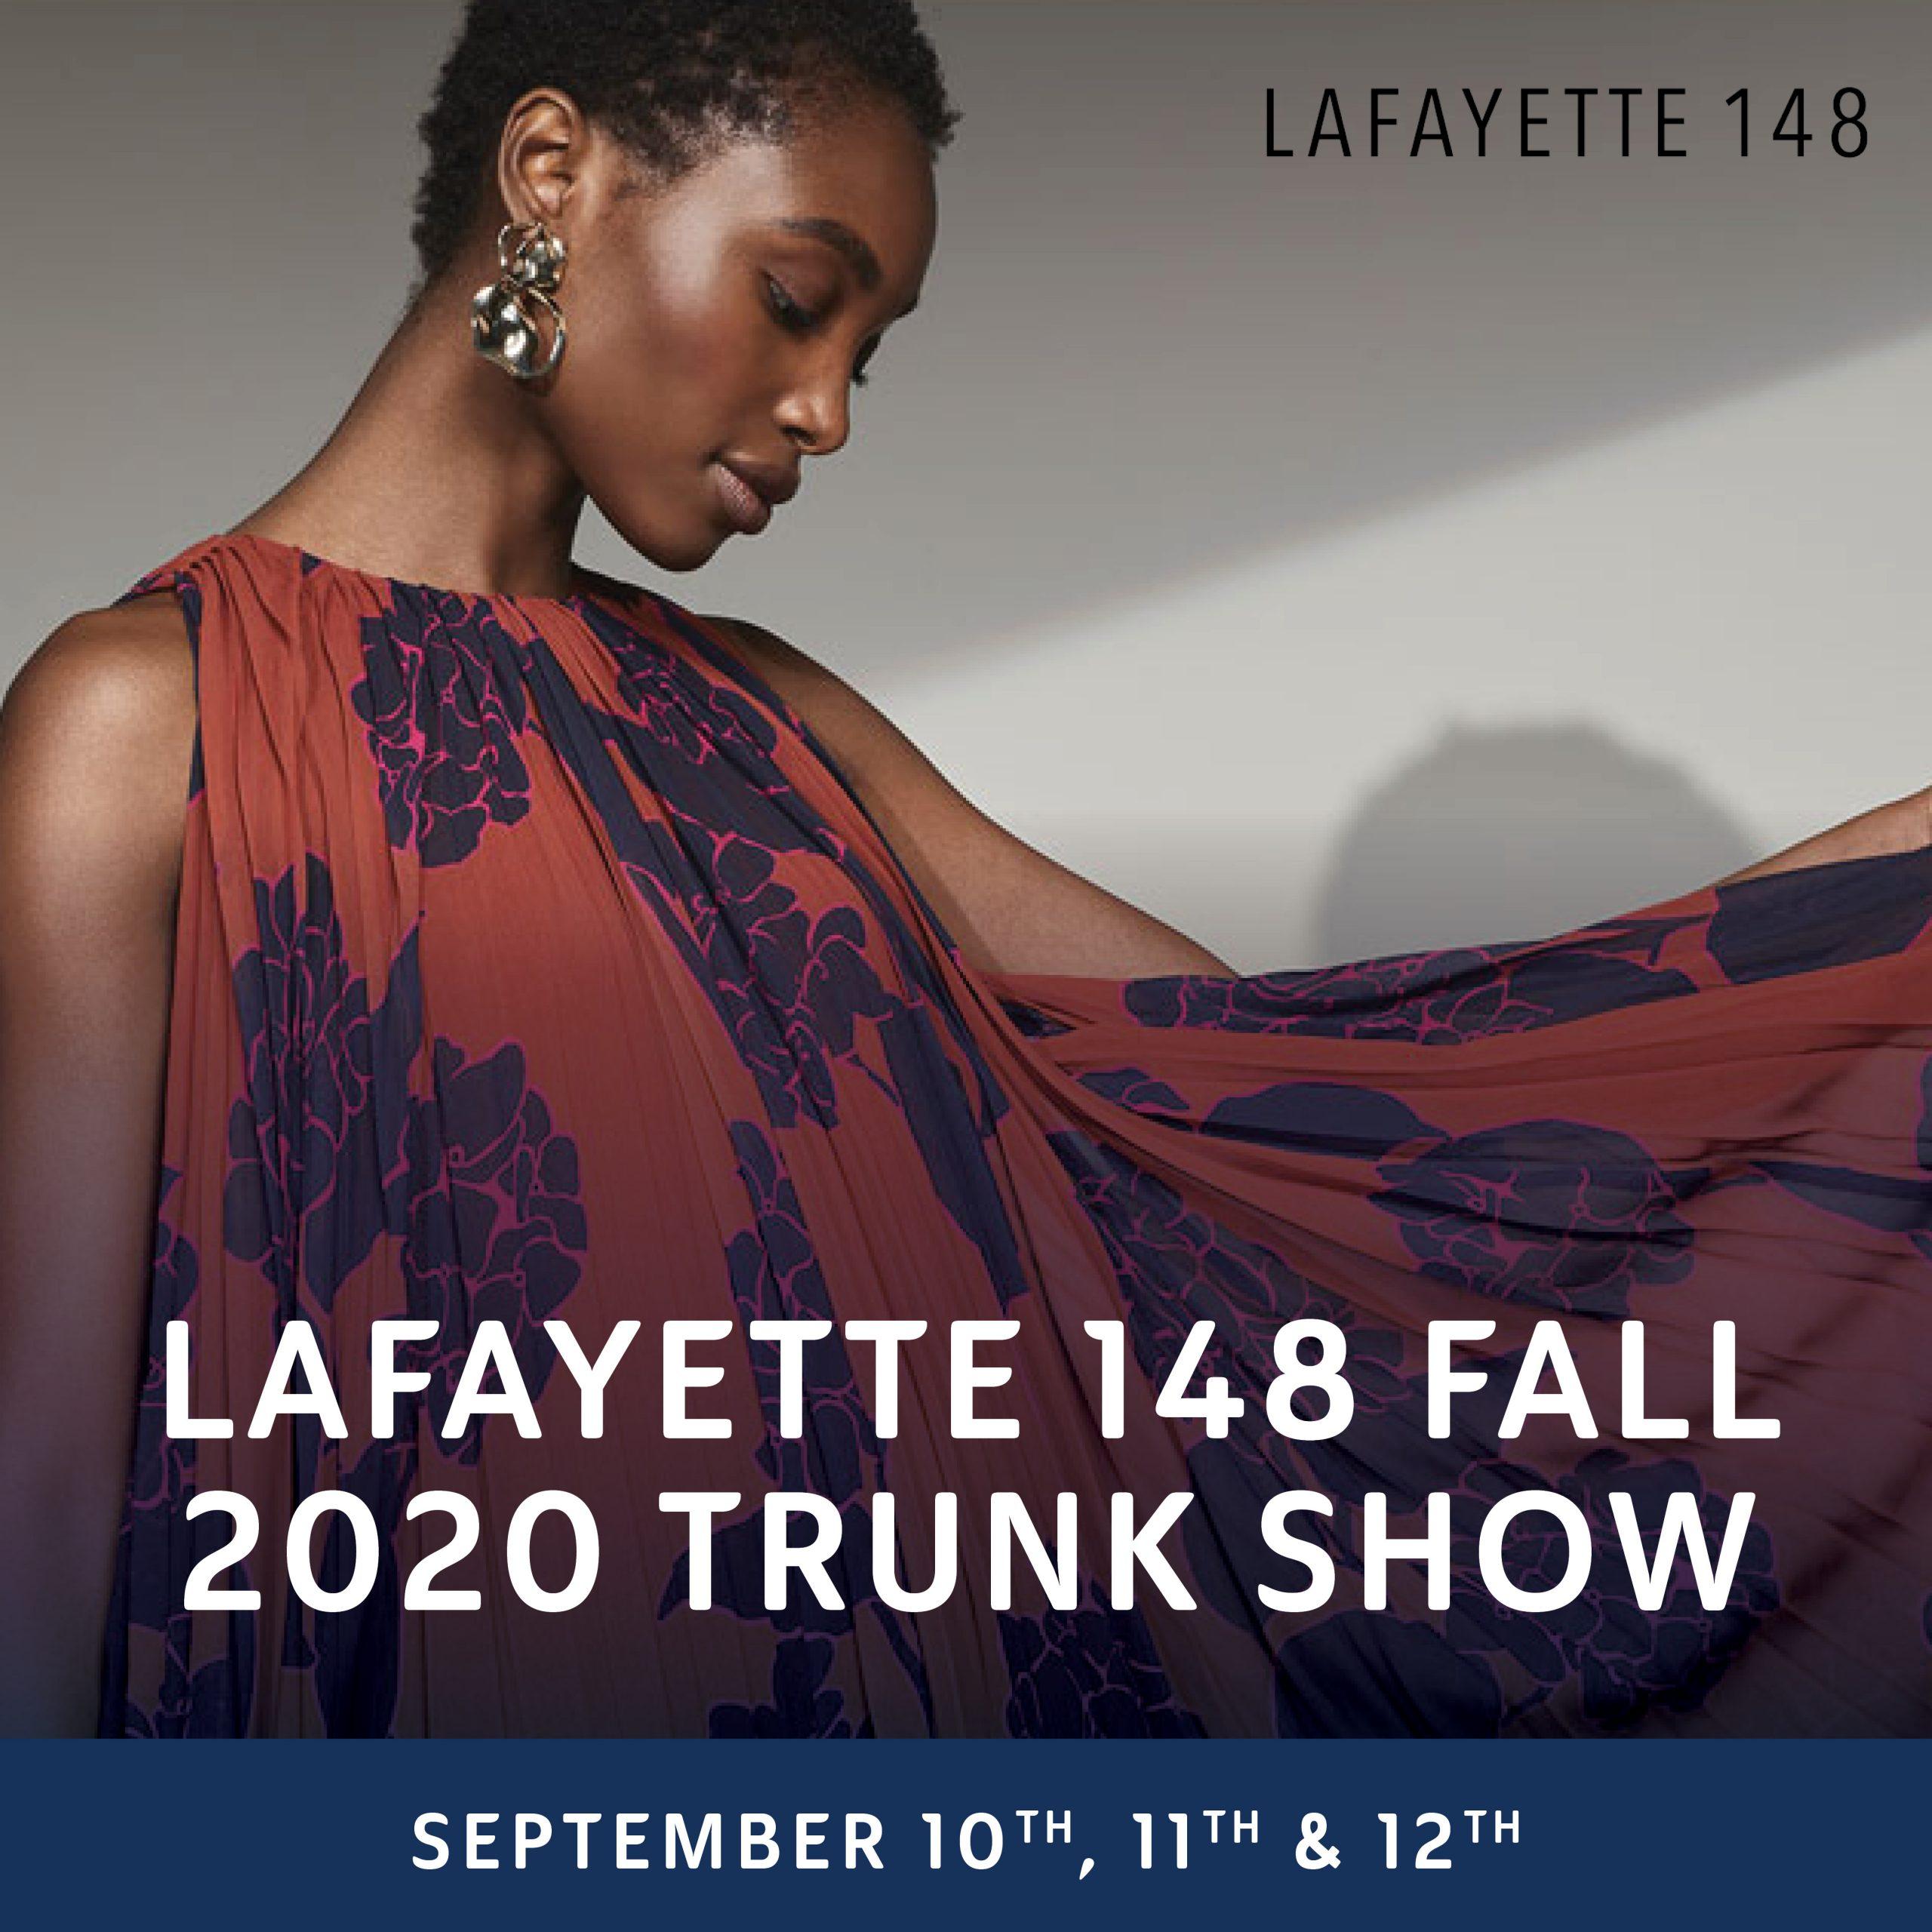 Lafayette 148 Trunk Show